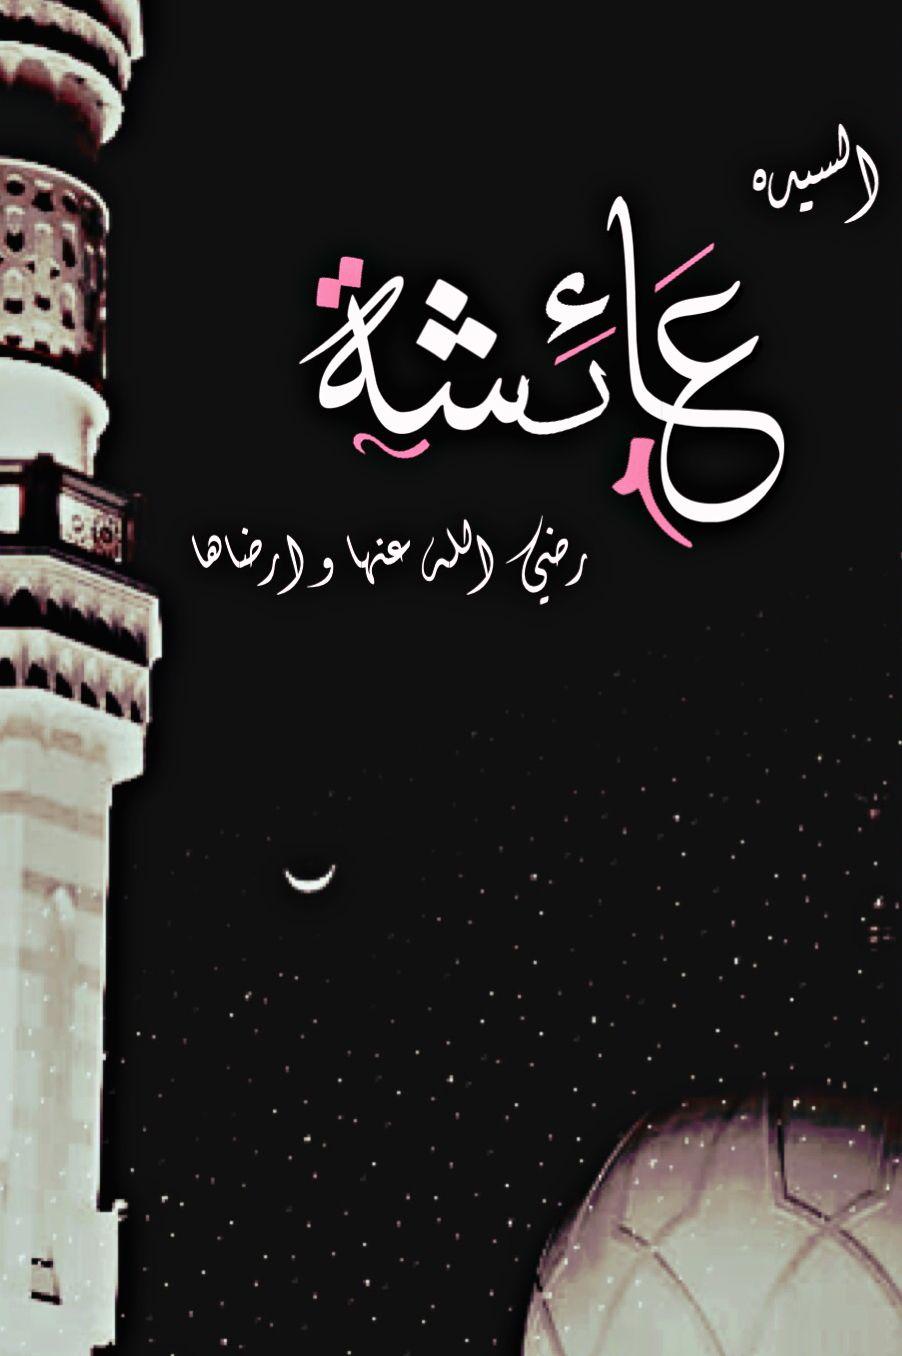 السيده عائشه رضي الله عنها و ارضاها Islamic Paintings Arabic Calligraphy Painting Calligraphy Painting